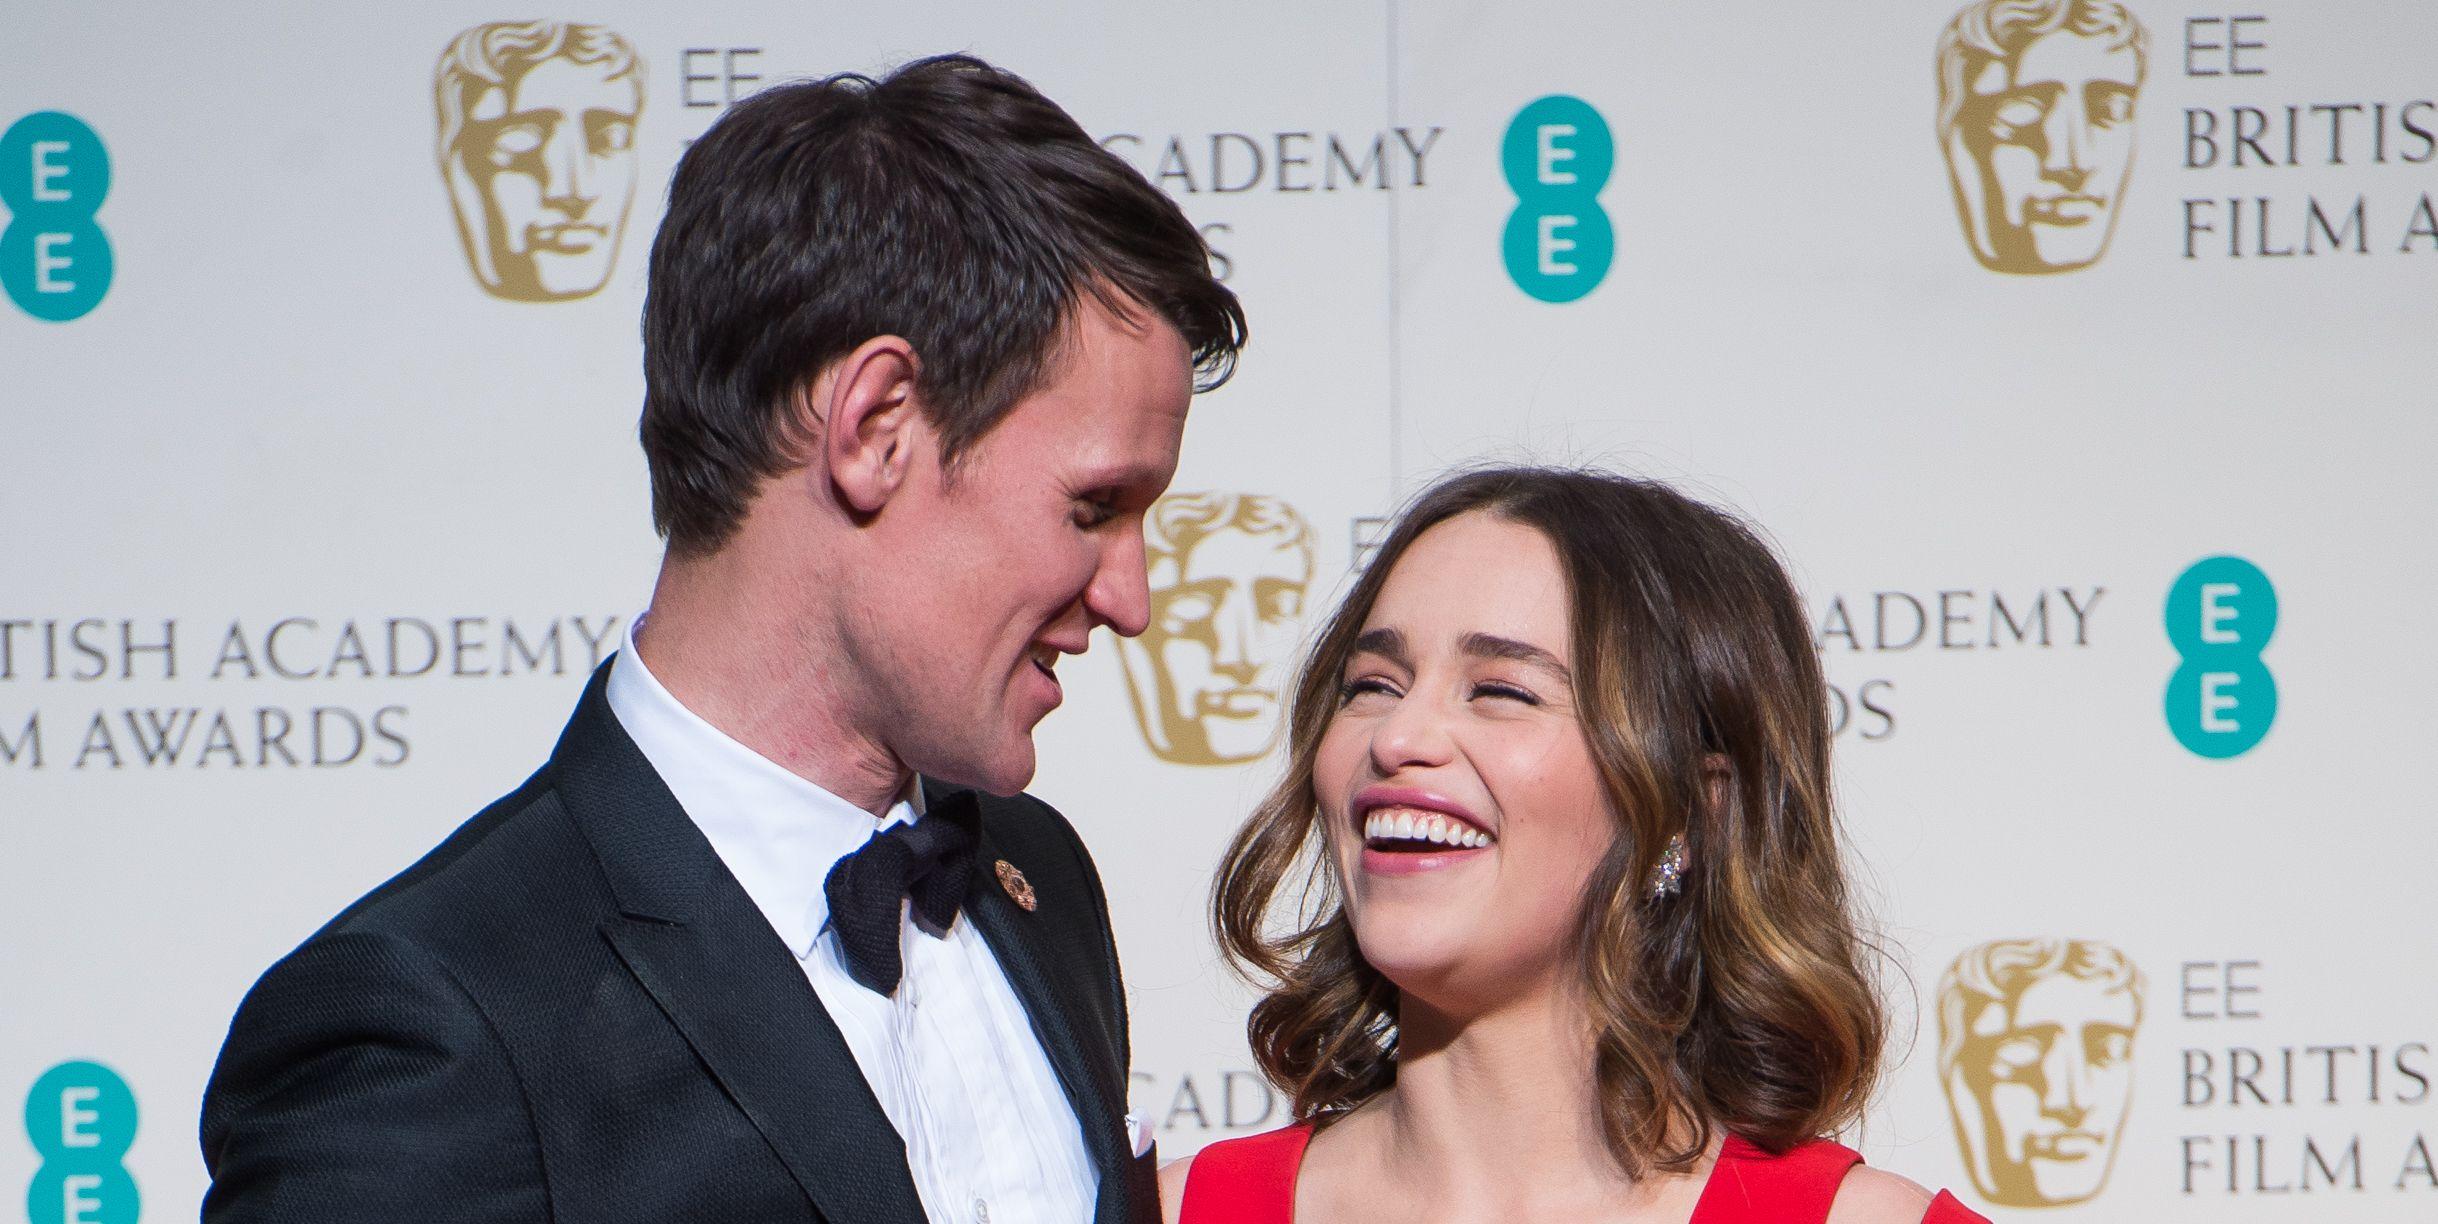 Are Emilia Clarke and Matt Smith Dating? – News Reader Board